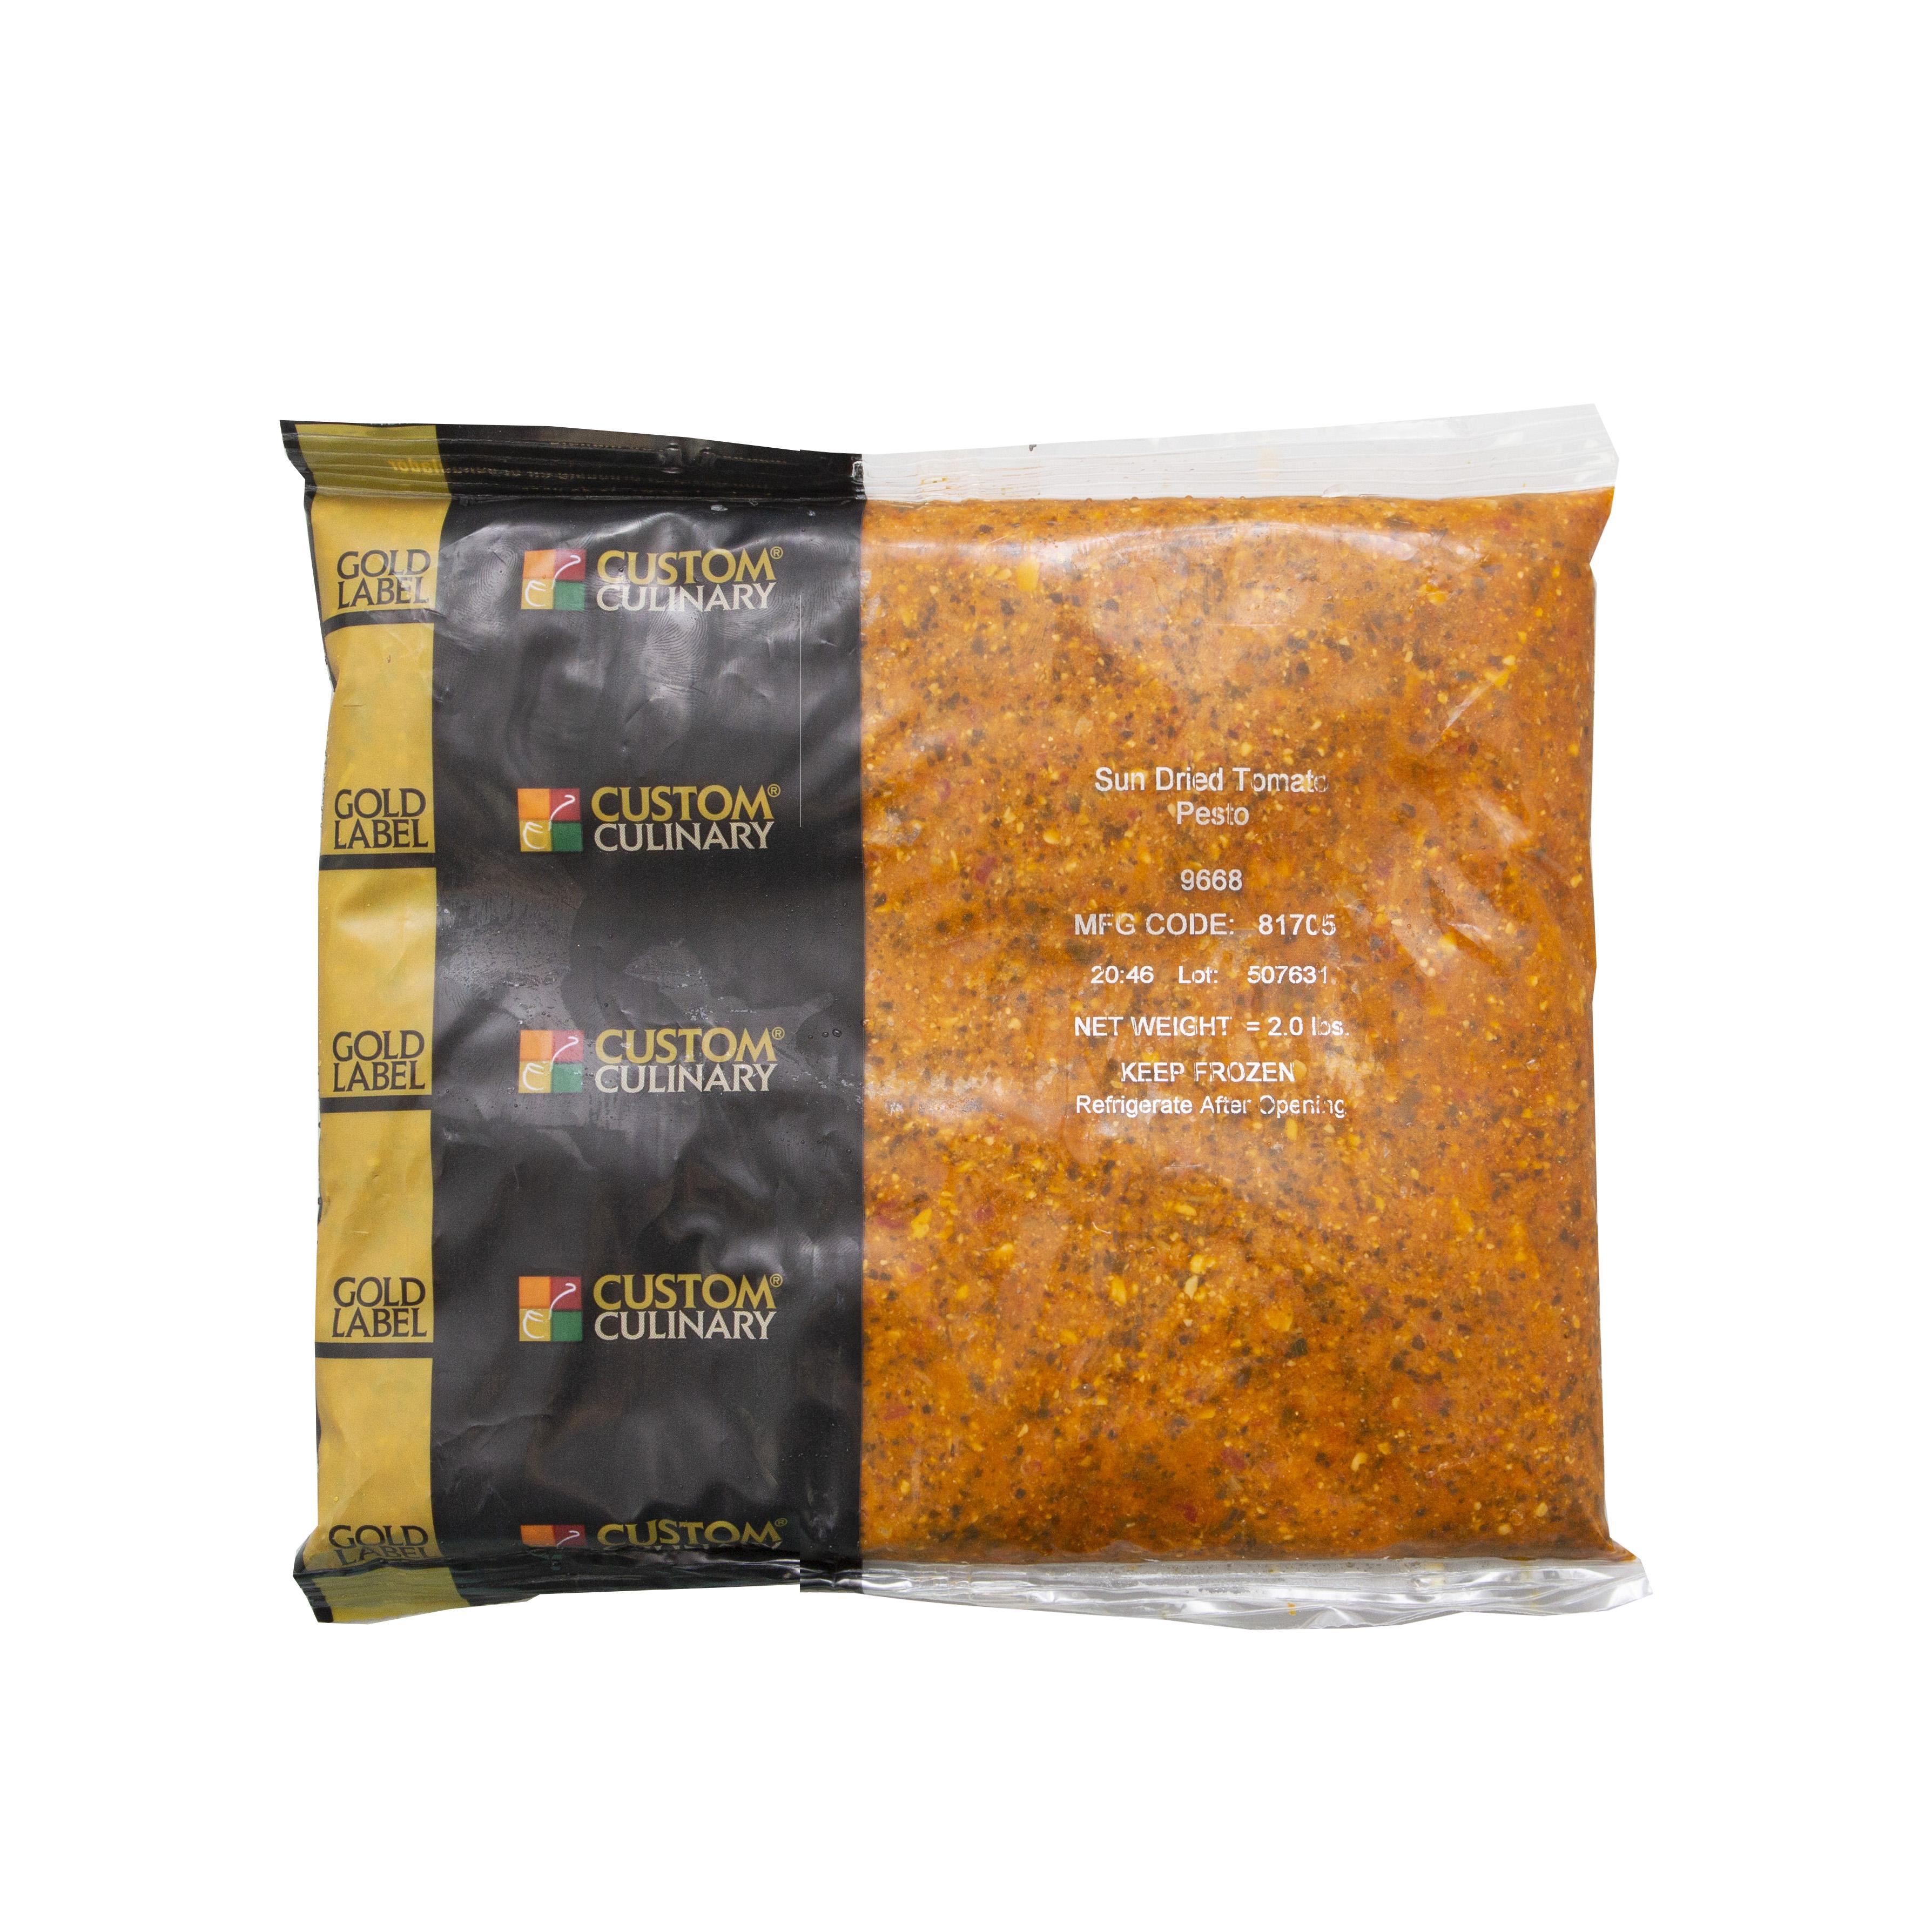 9668 - Gold Label Ready-To-Use Sundried Pesto Sauce